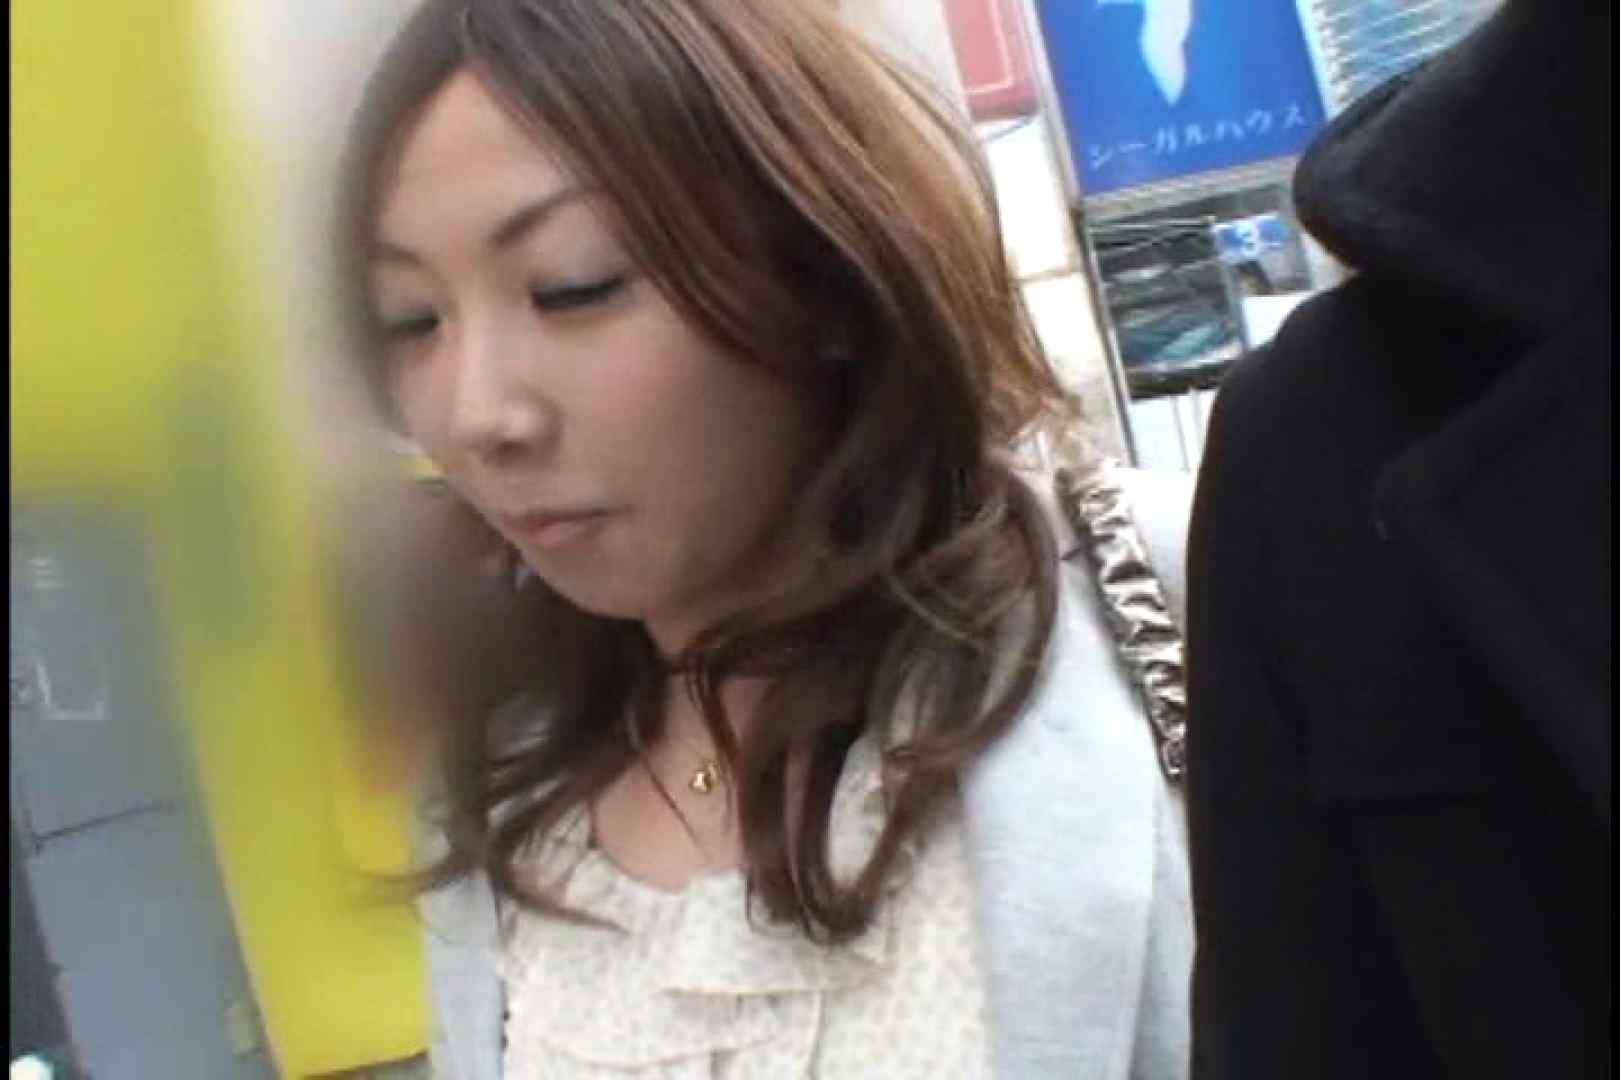 JDハンター全国ツアー vol.041 前編 女子大生のエロ動画  85PIX 2